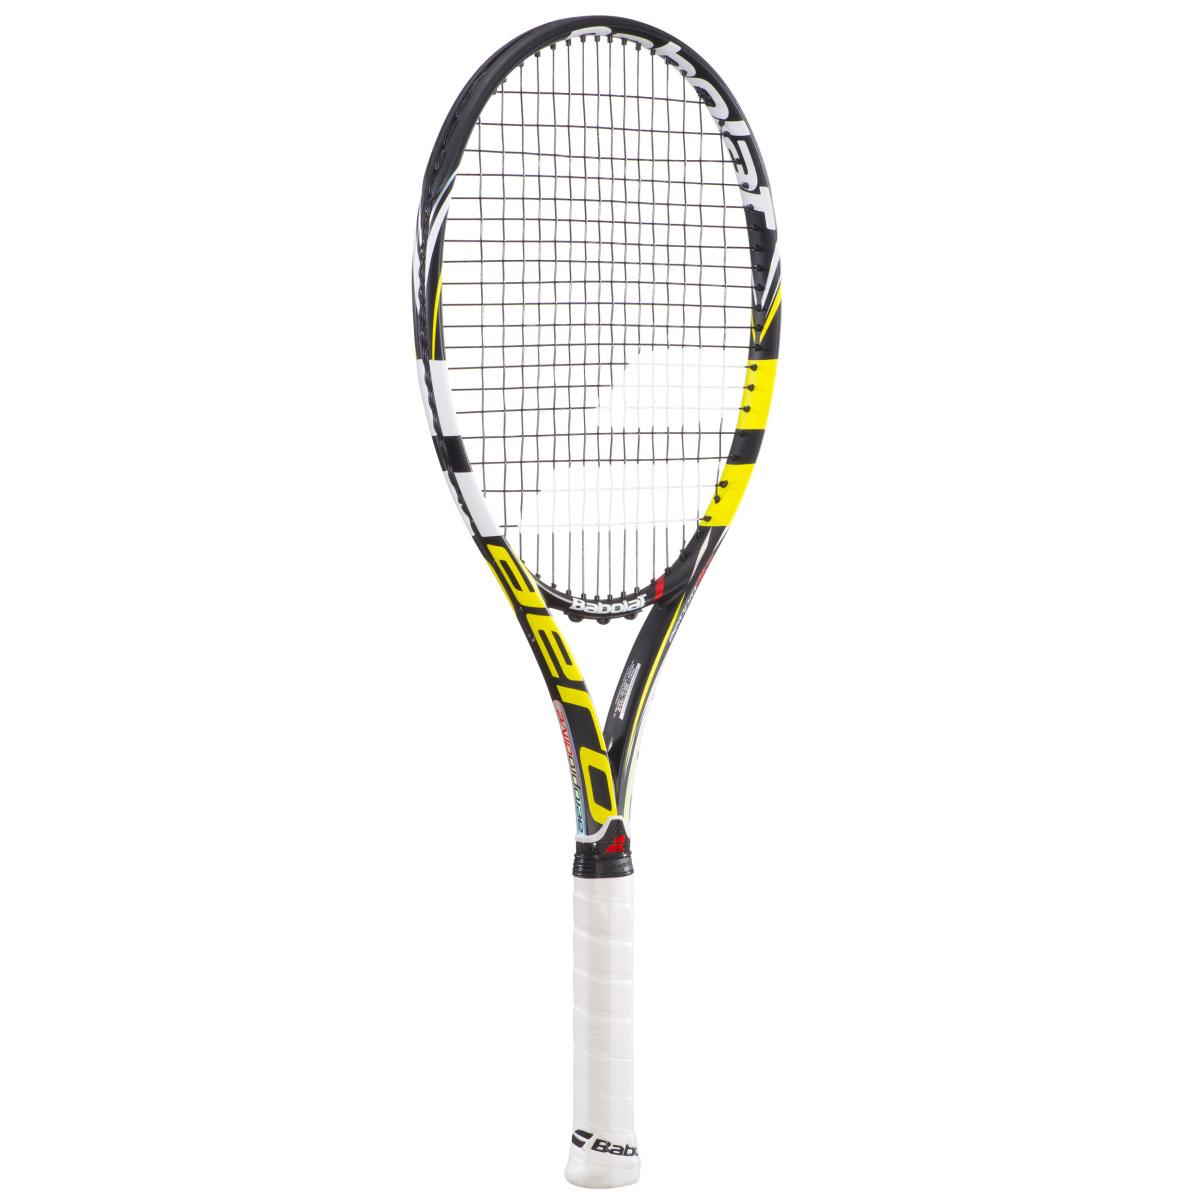 Babolat AeroPro Drive GT Tennis Racket – Grip 2